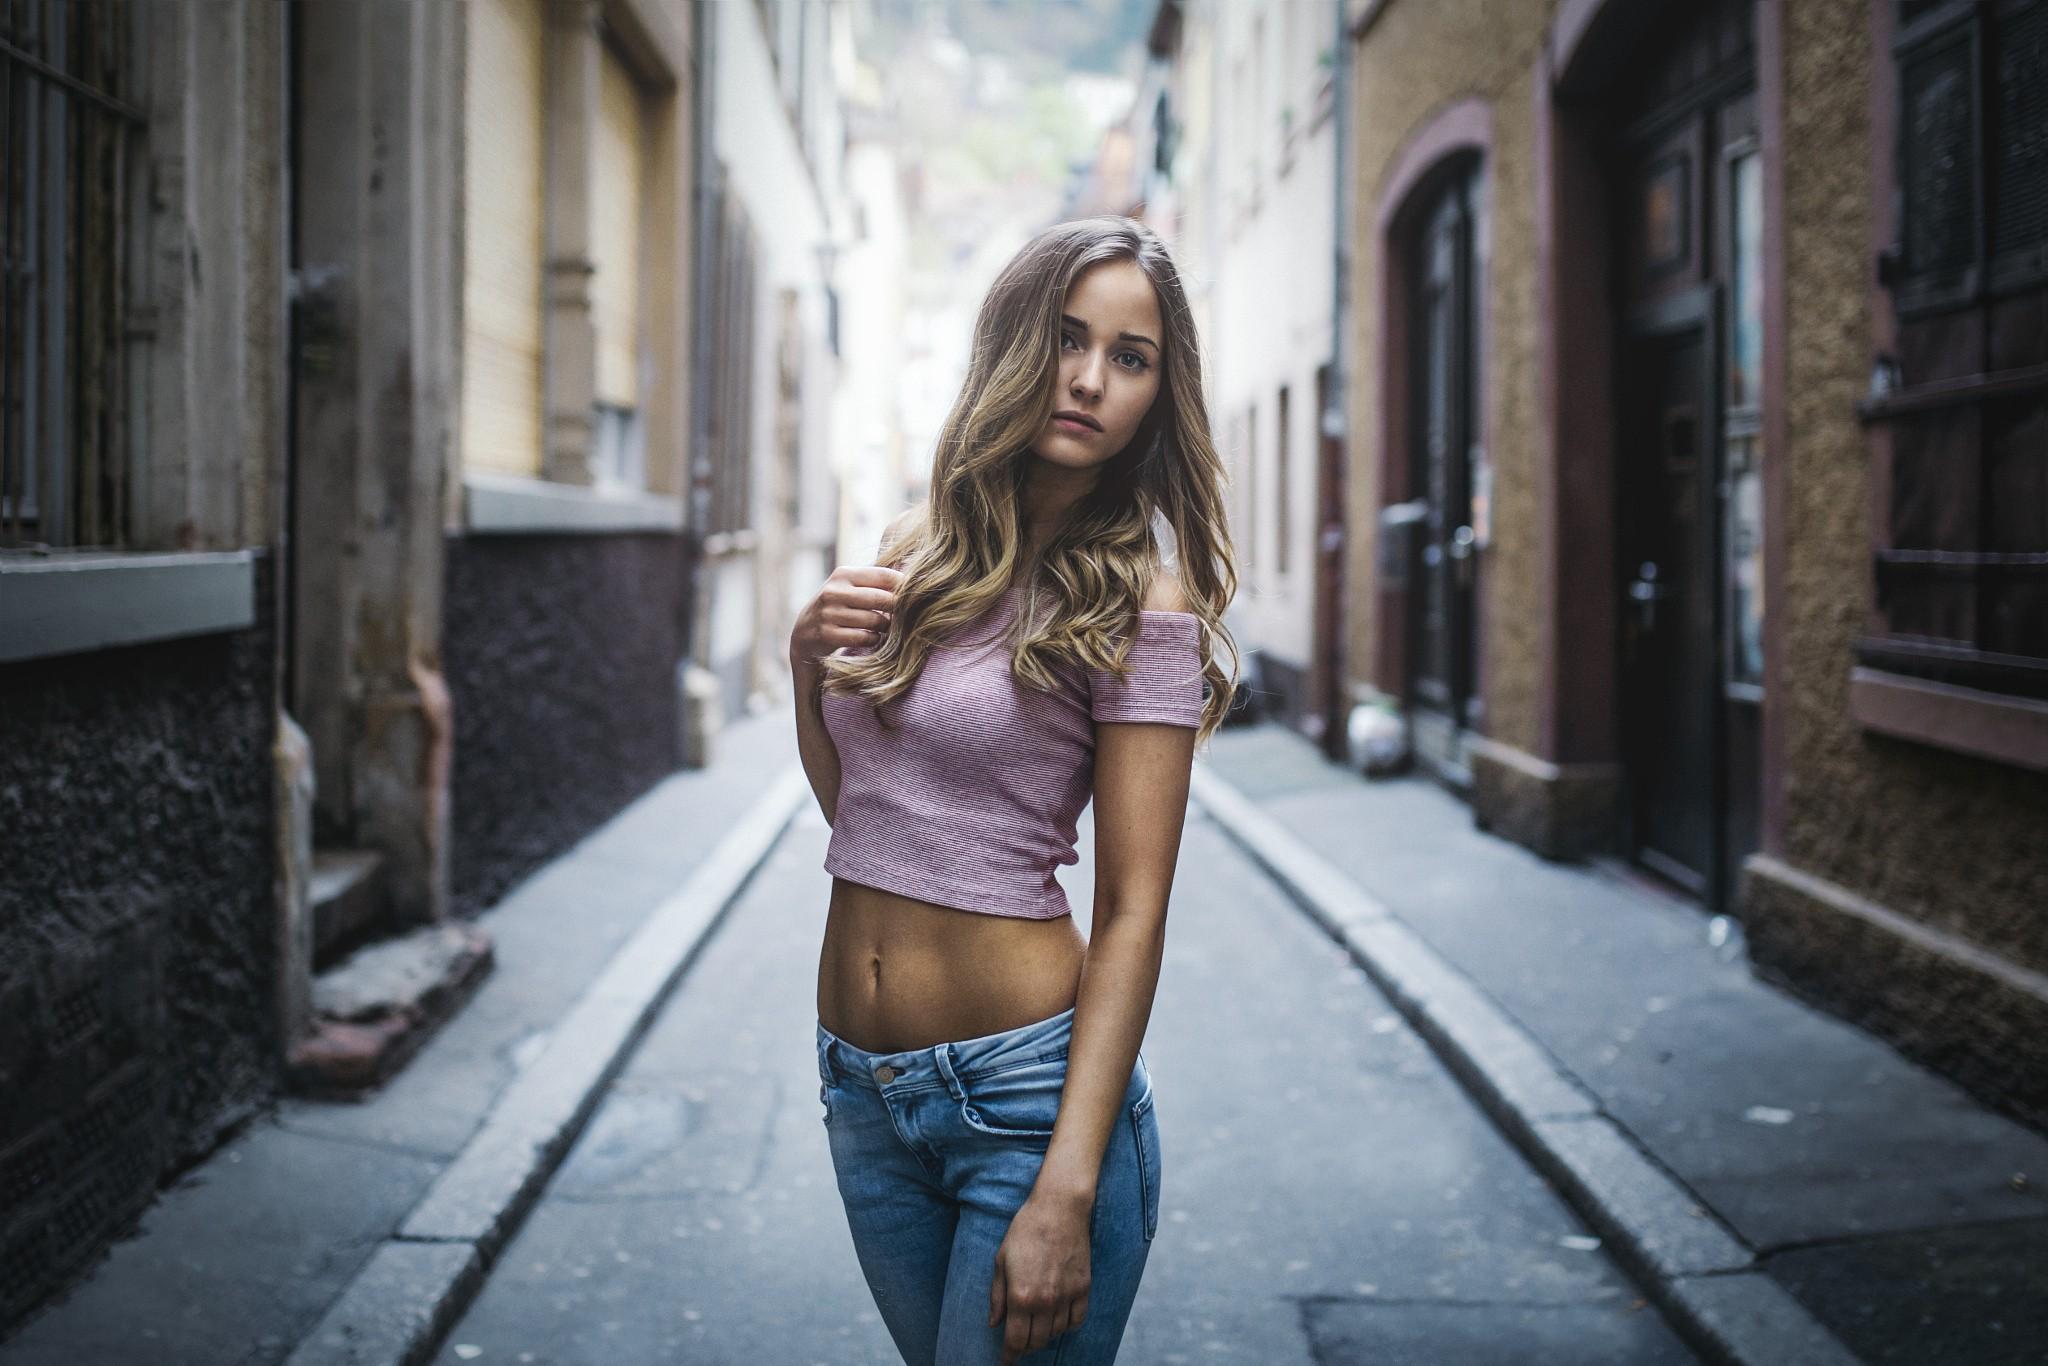 ulichnie-devki-video-galerei-foto-drochki